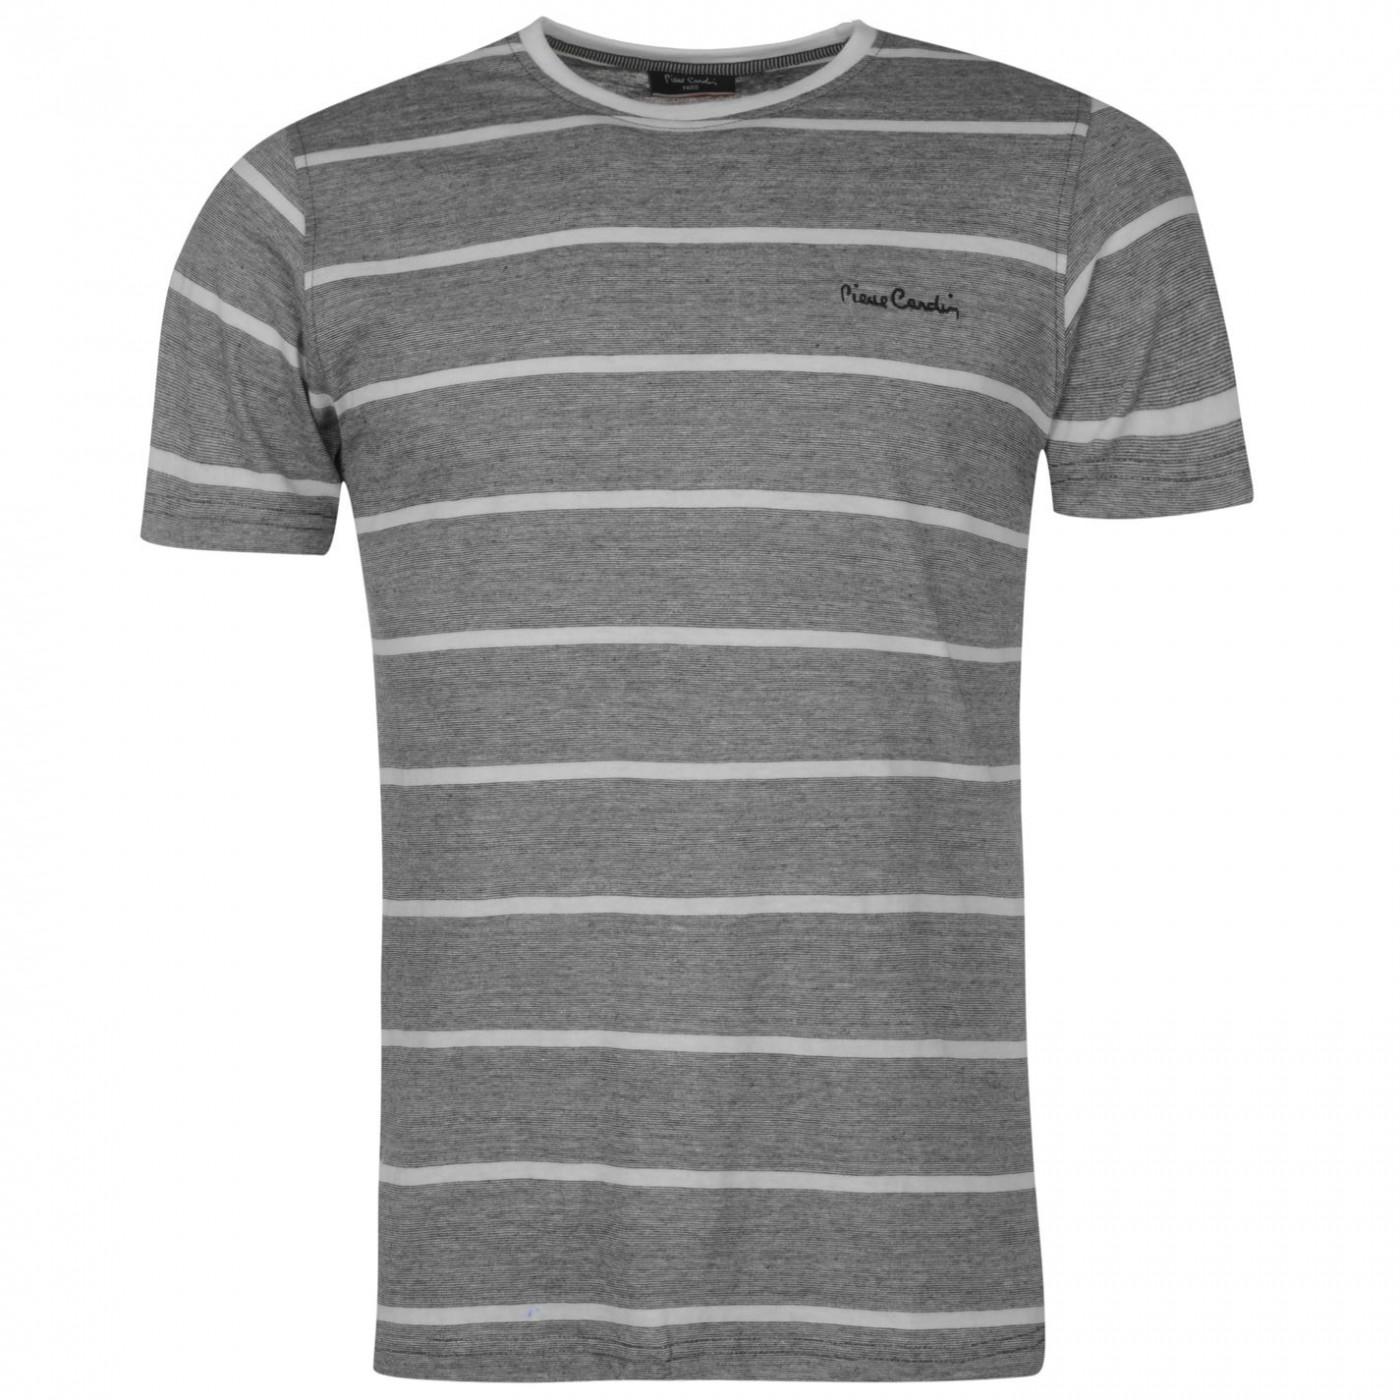 08b239247f95 Triko Triko Pierre Cardin Slub Striped T Shirt pánské - FACTCOOL